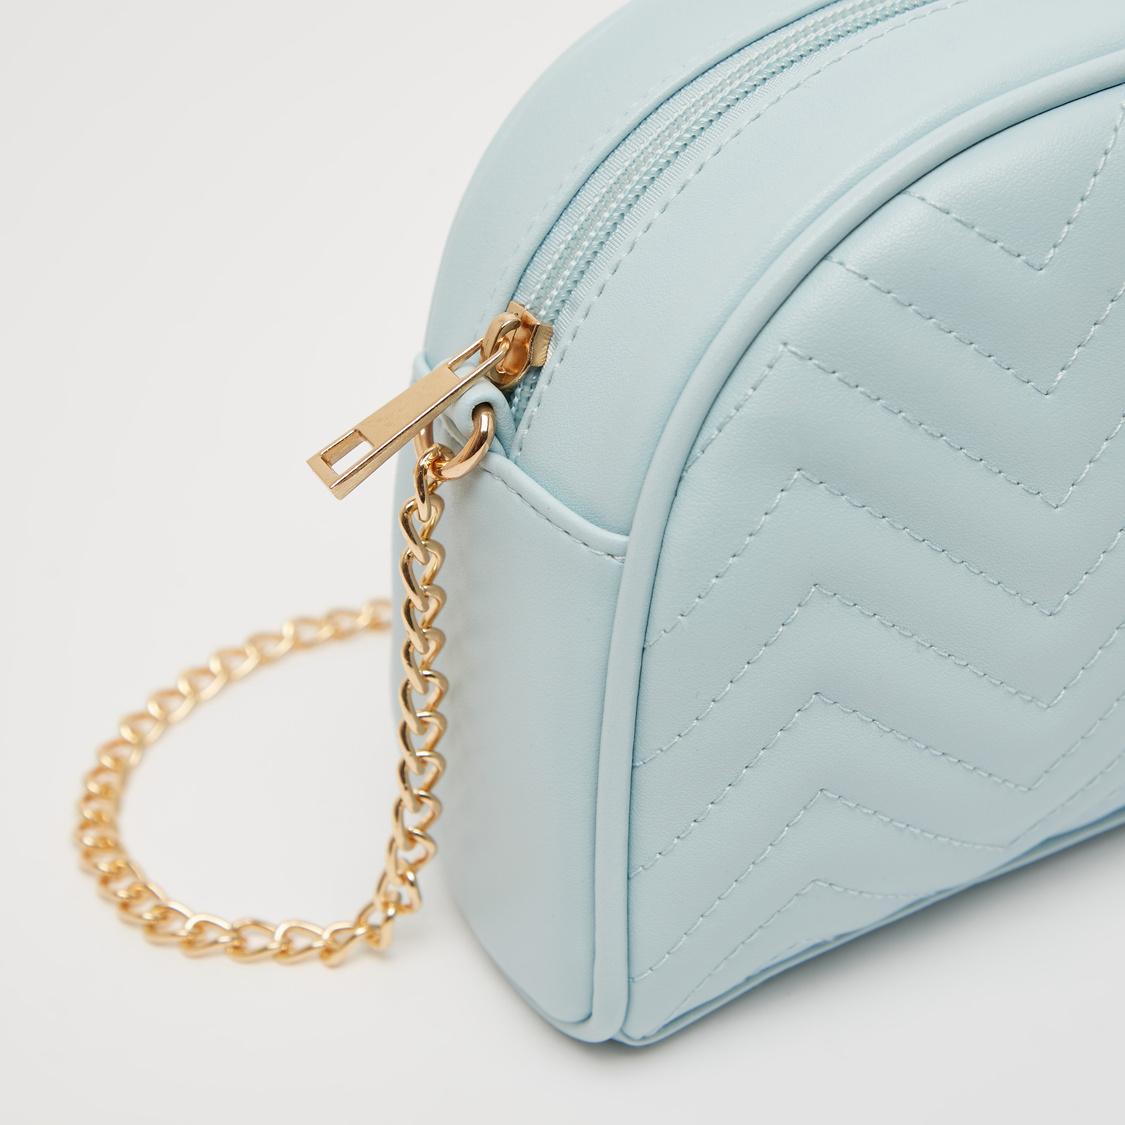 Textured Crossbody Bag with Metallic Chain and Zip Closure